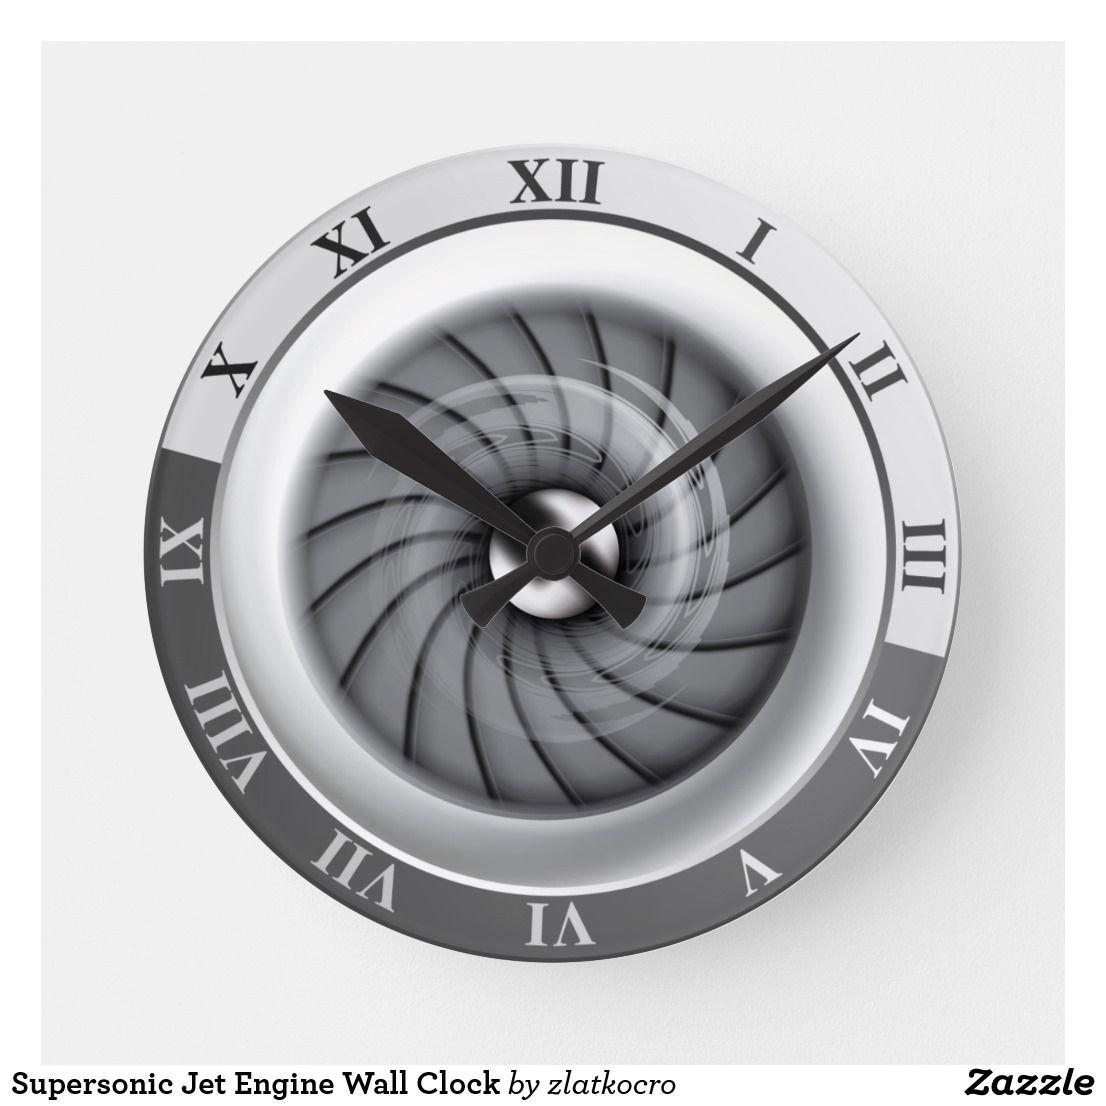 Supersonic Jet Engine Wall Clock Zazzle Com Wall Clock Clock Jet Engine